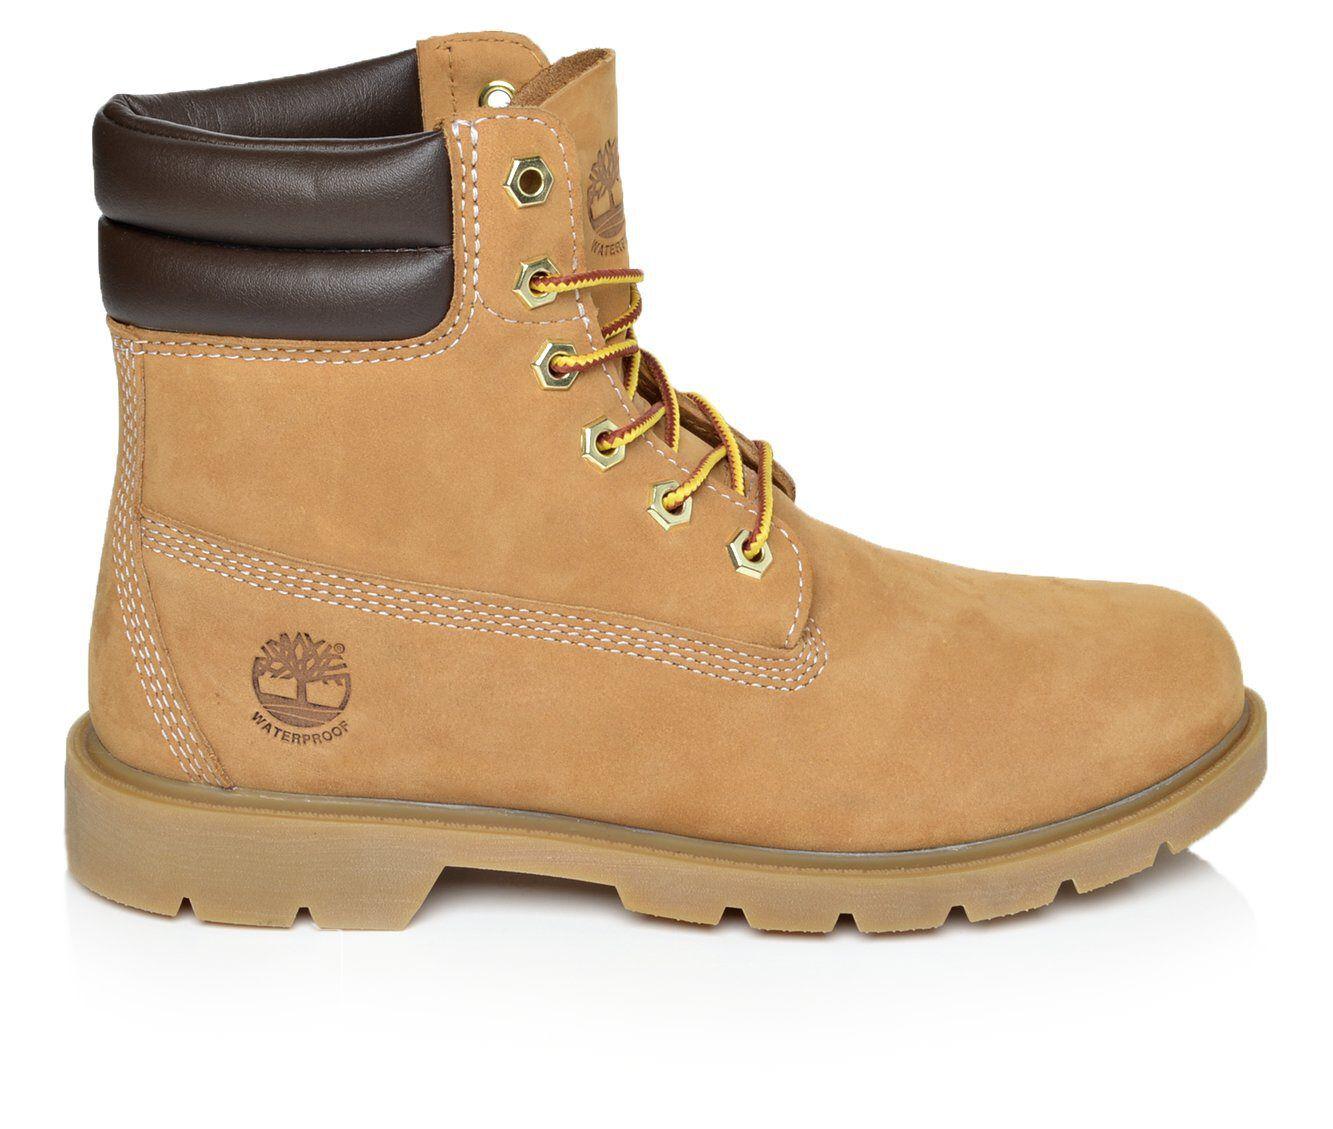 Women's Timberland Linden Woods Boots Wheat